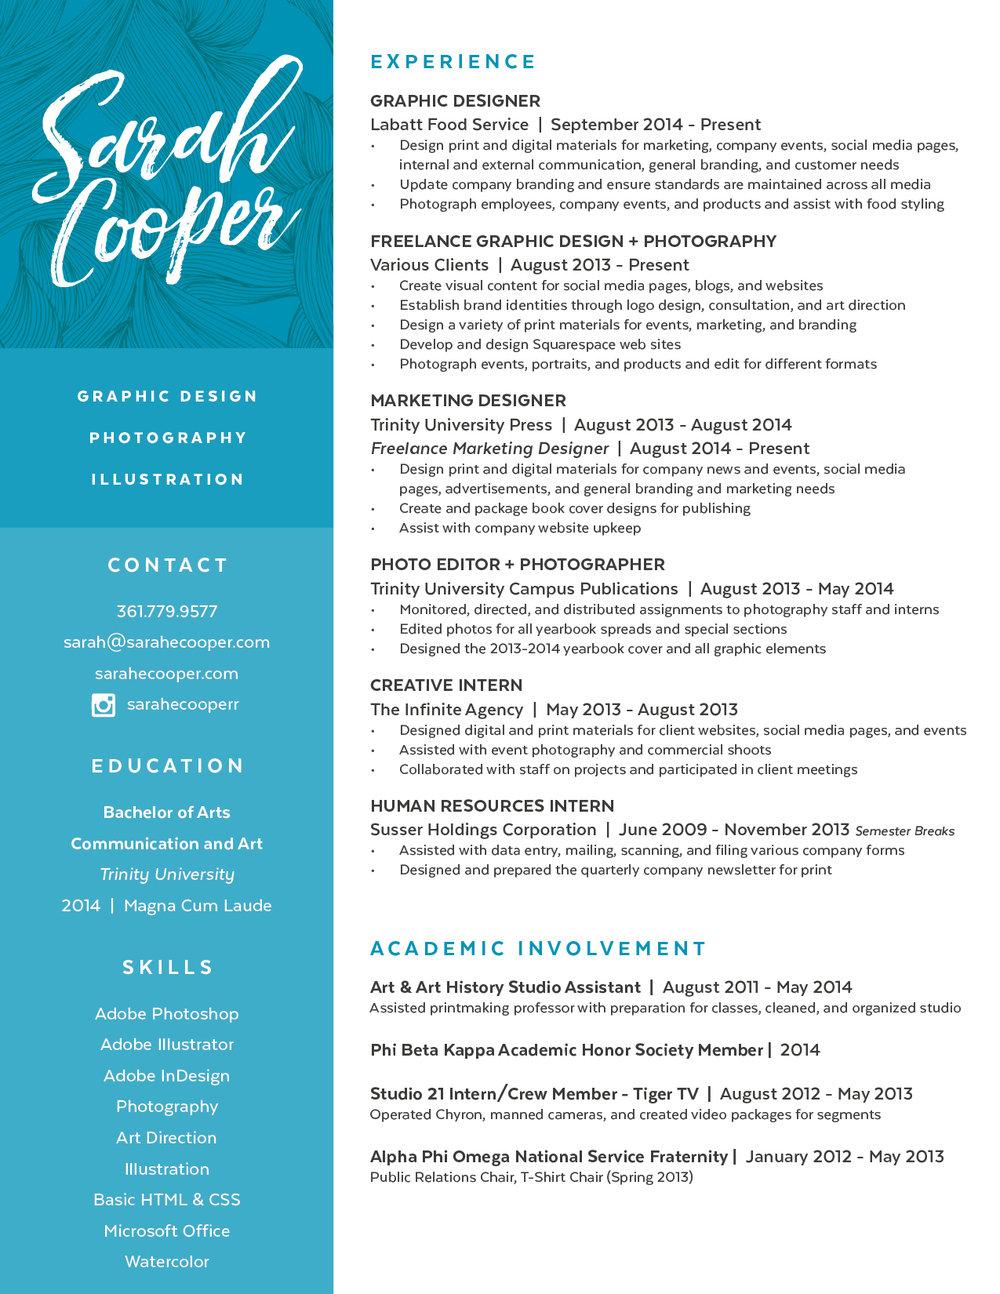 SarahCooper_Resume_6-2017.jpg